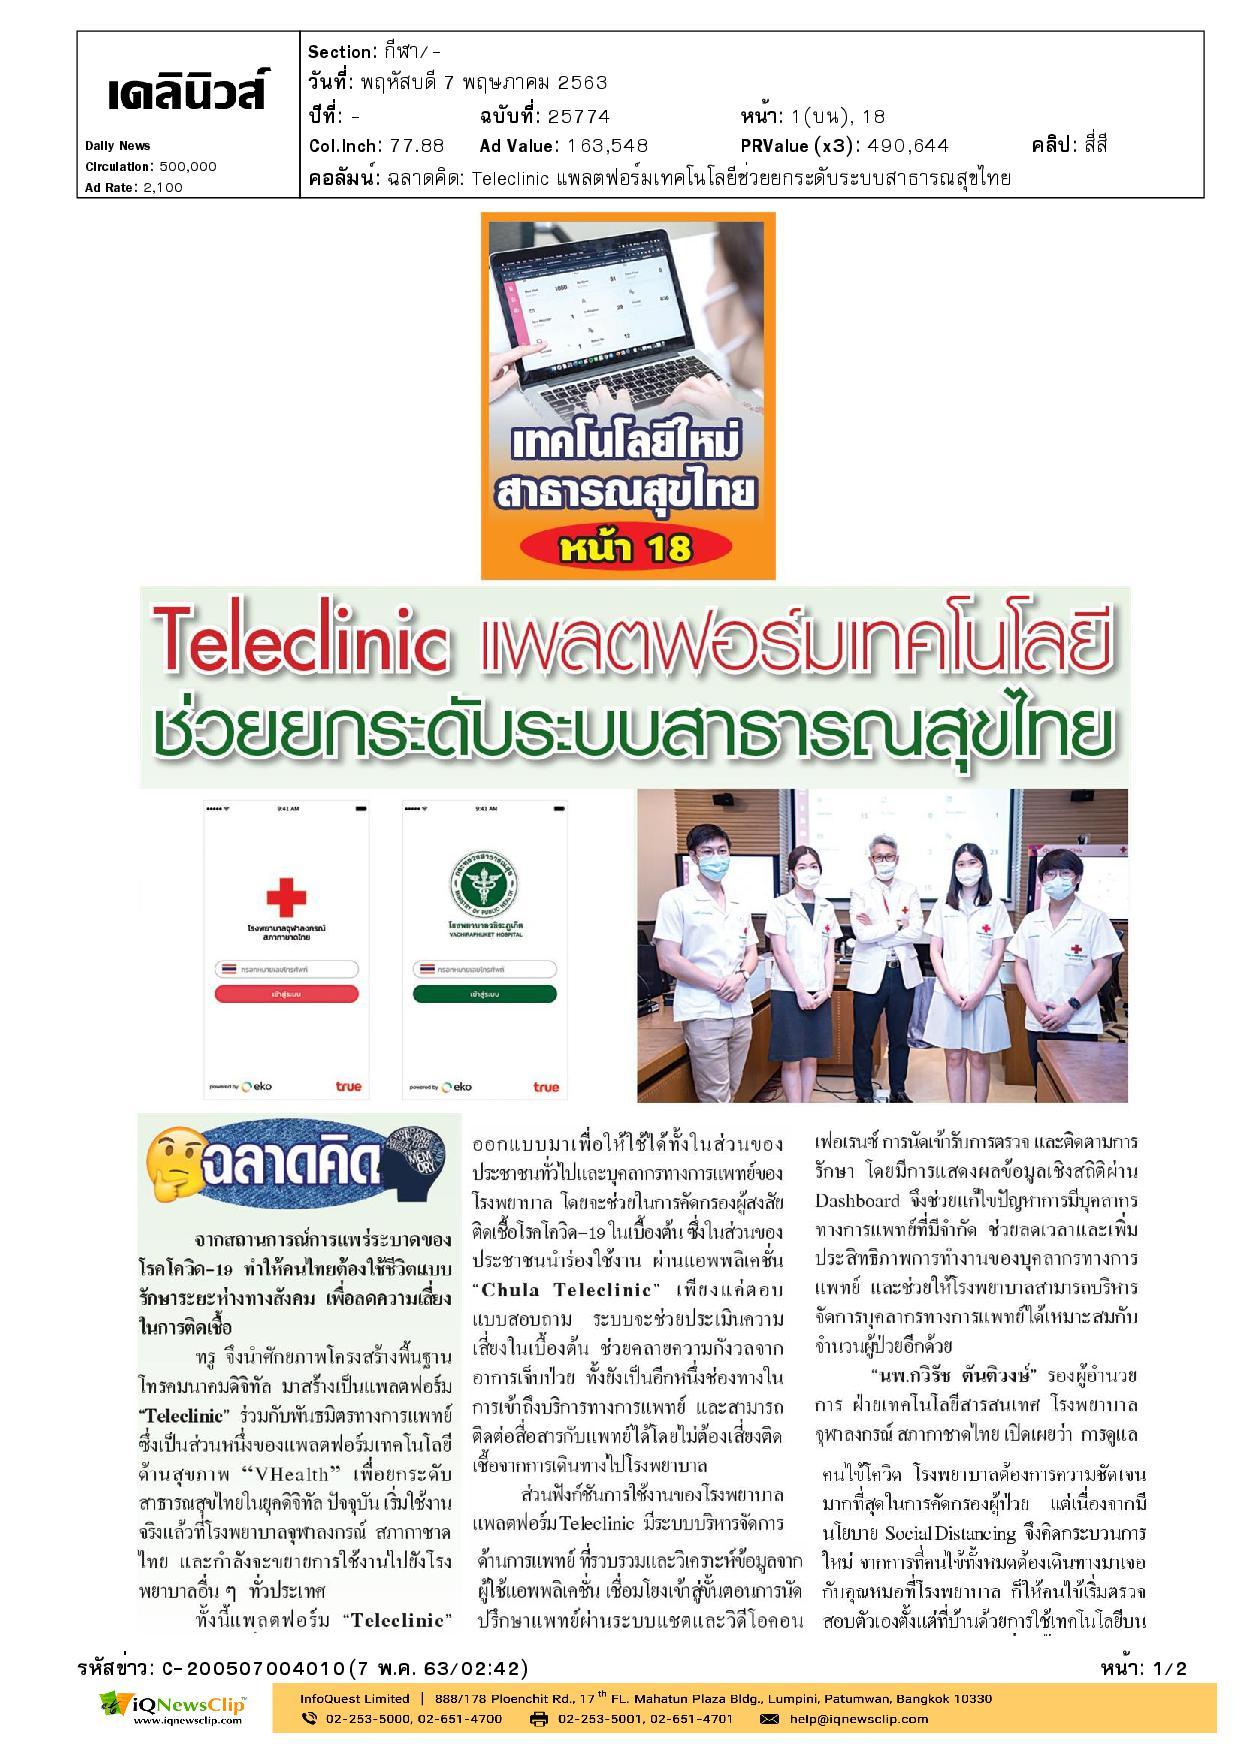 Teleclinic  ช่วยยกระดับระบบสาธารณสุขไทย